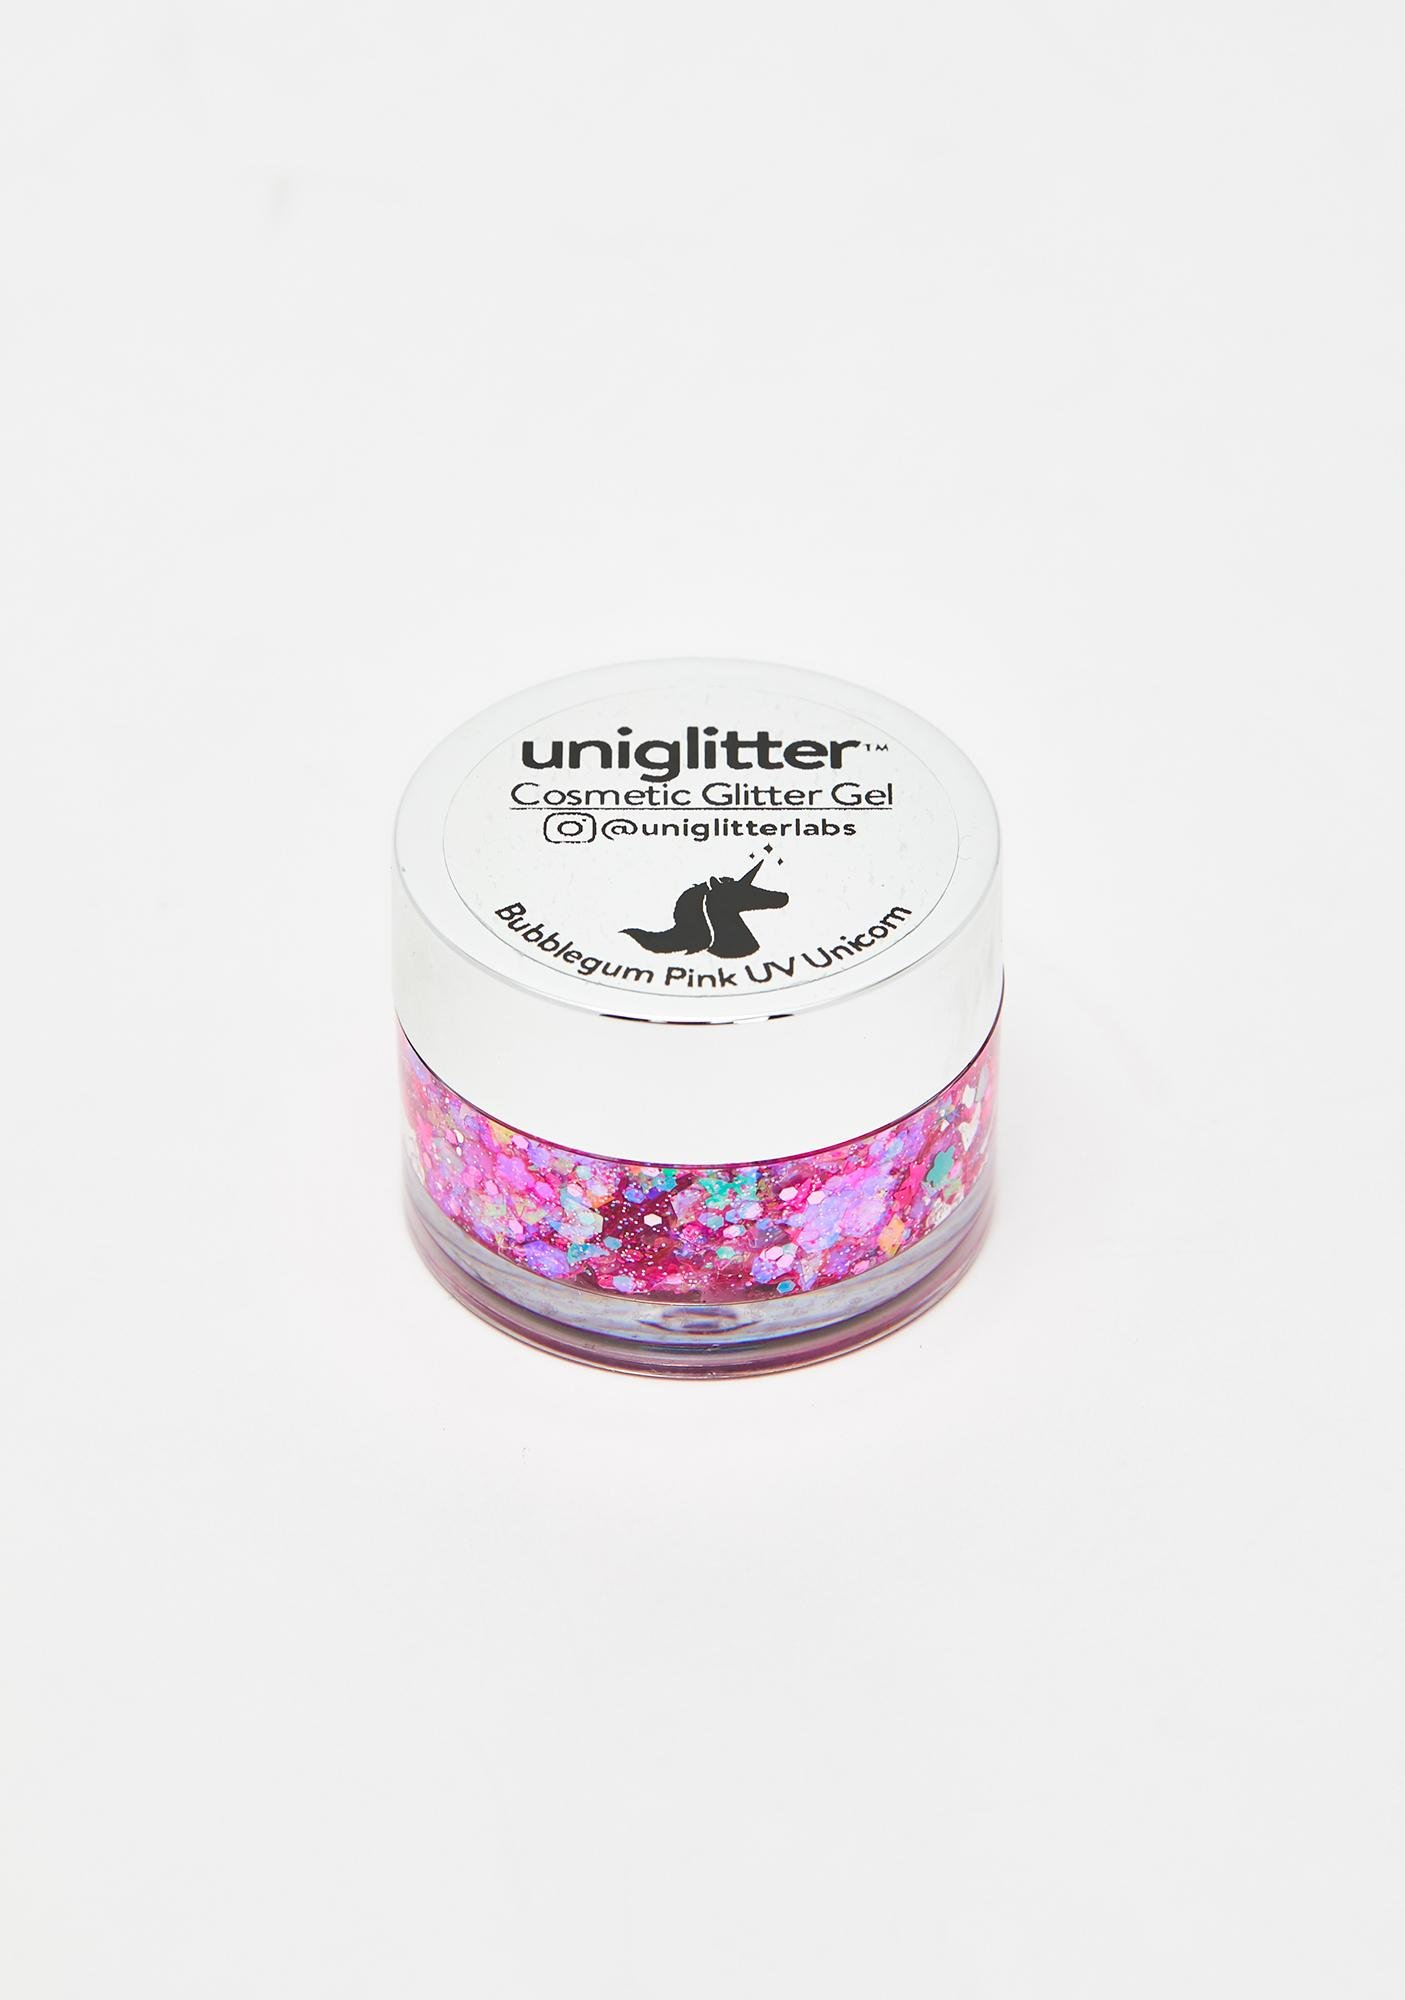 Uniglitter Bubblegum Pink UV Unicorn Glitter Gel